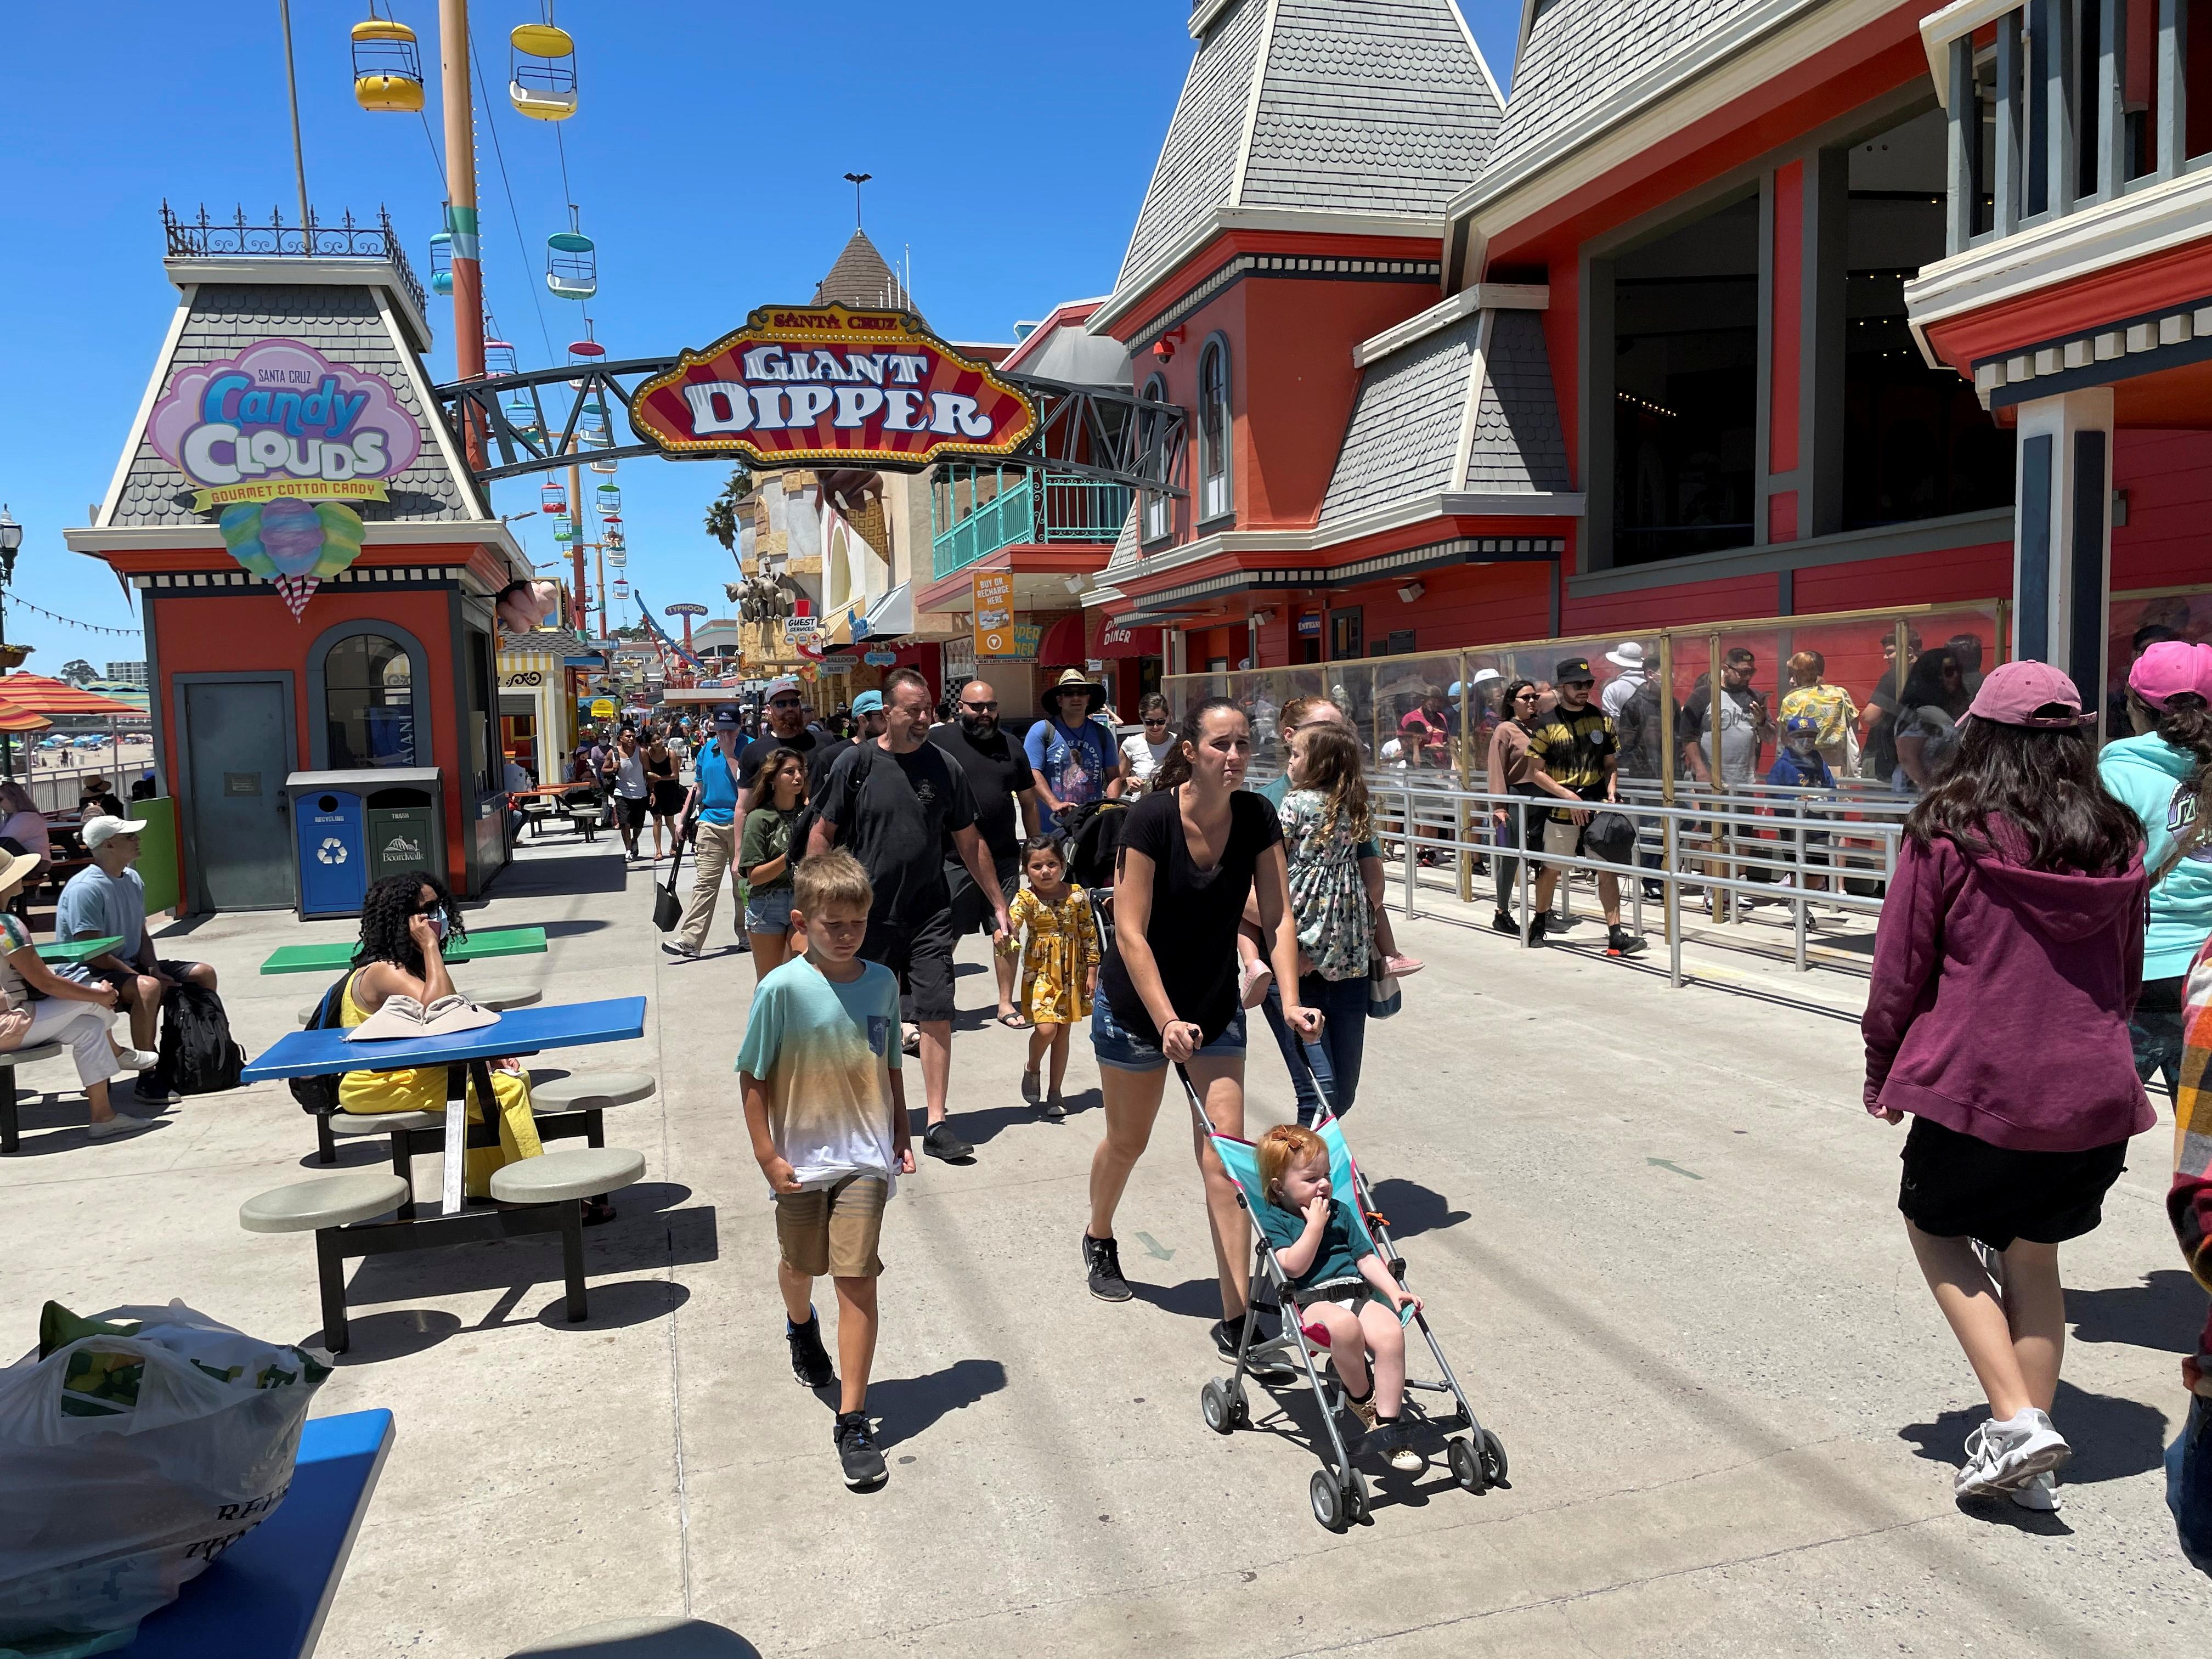 People walk past the Giant Dipper rollercoaster ride at the Santa Cruz Beach Boardwalk, amid the coronavirus disease (COVID-19) outbreak, in Santa Cruz, California, U.S. June 28, 2021. REUTERS/Nathan Frandino